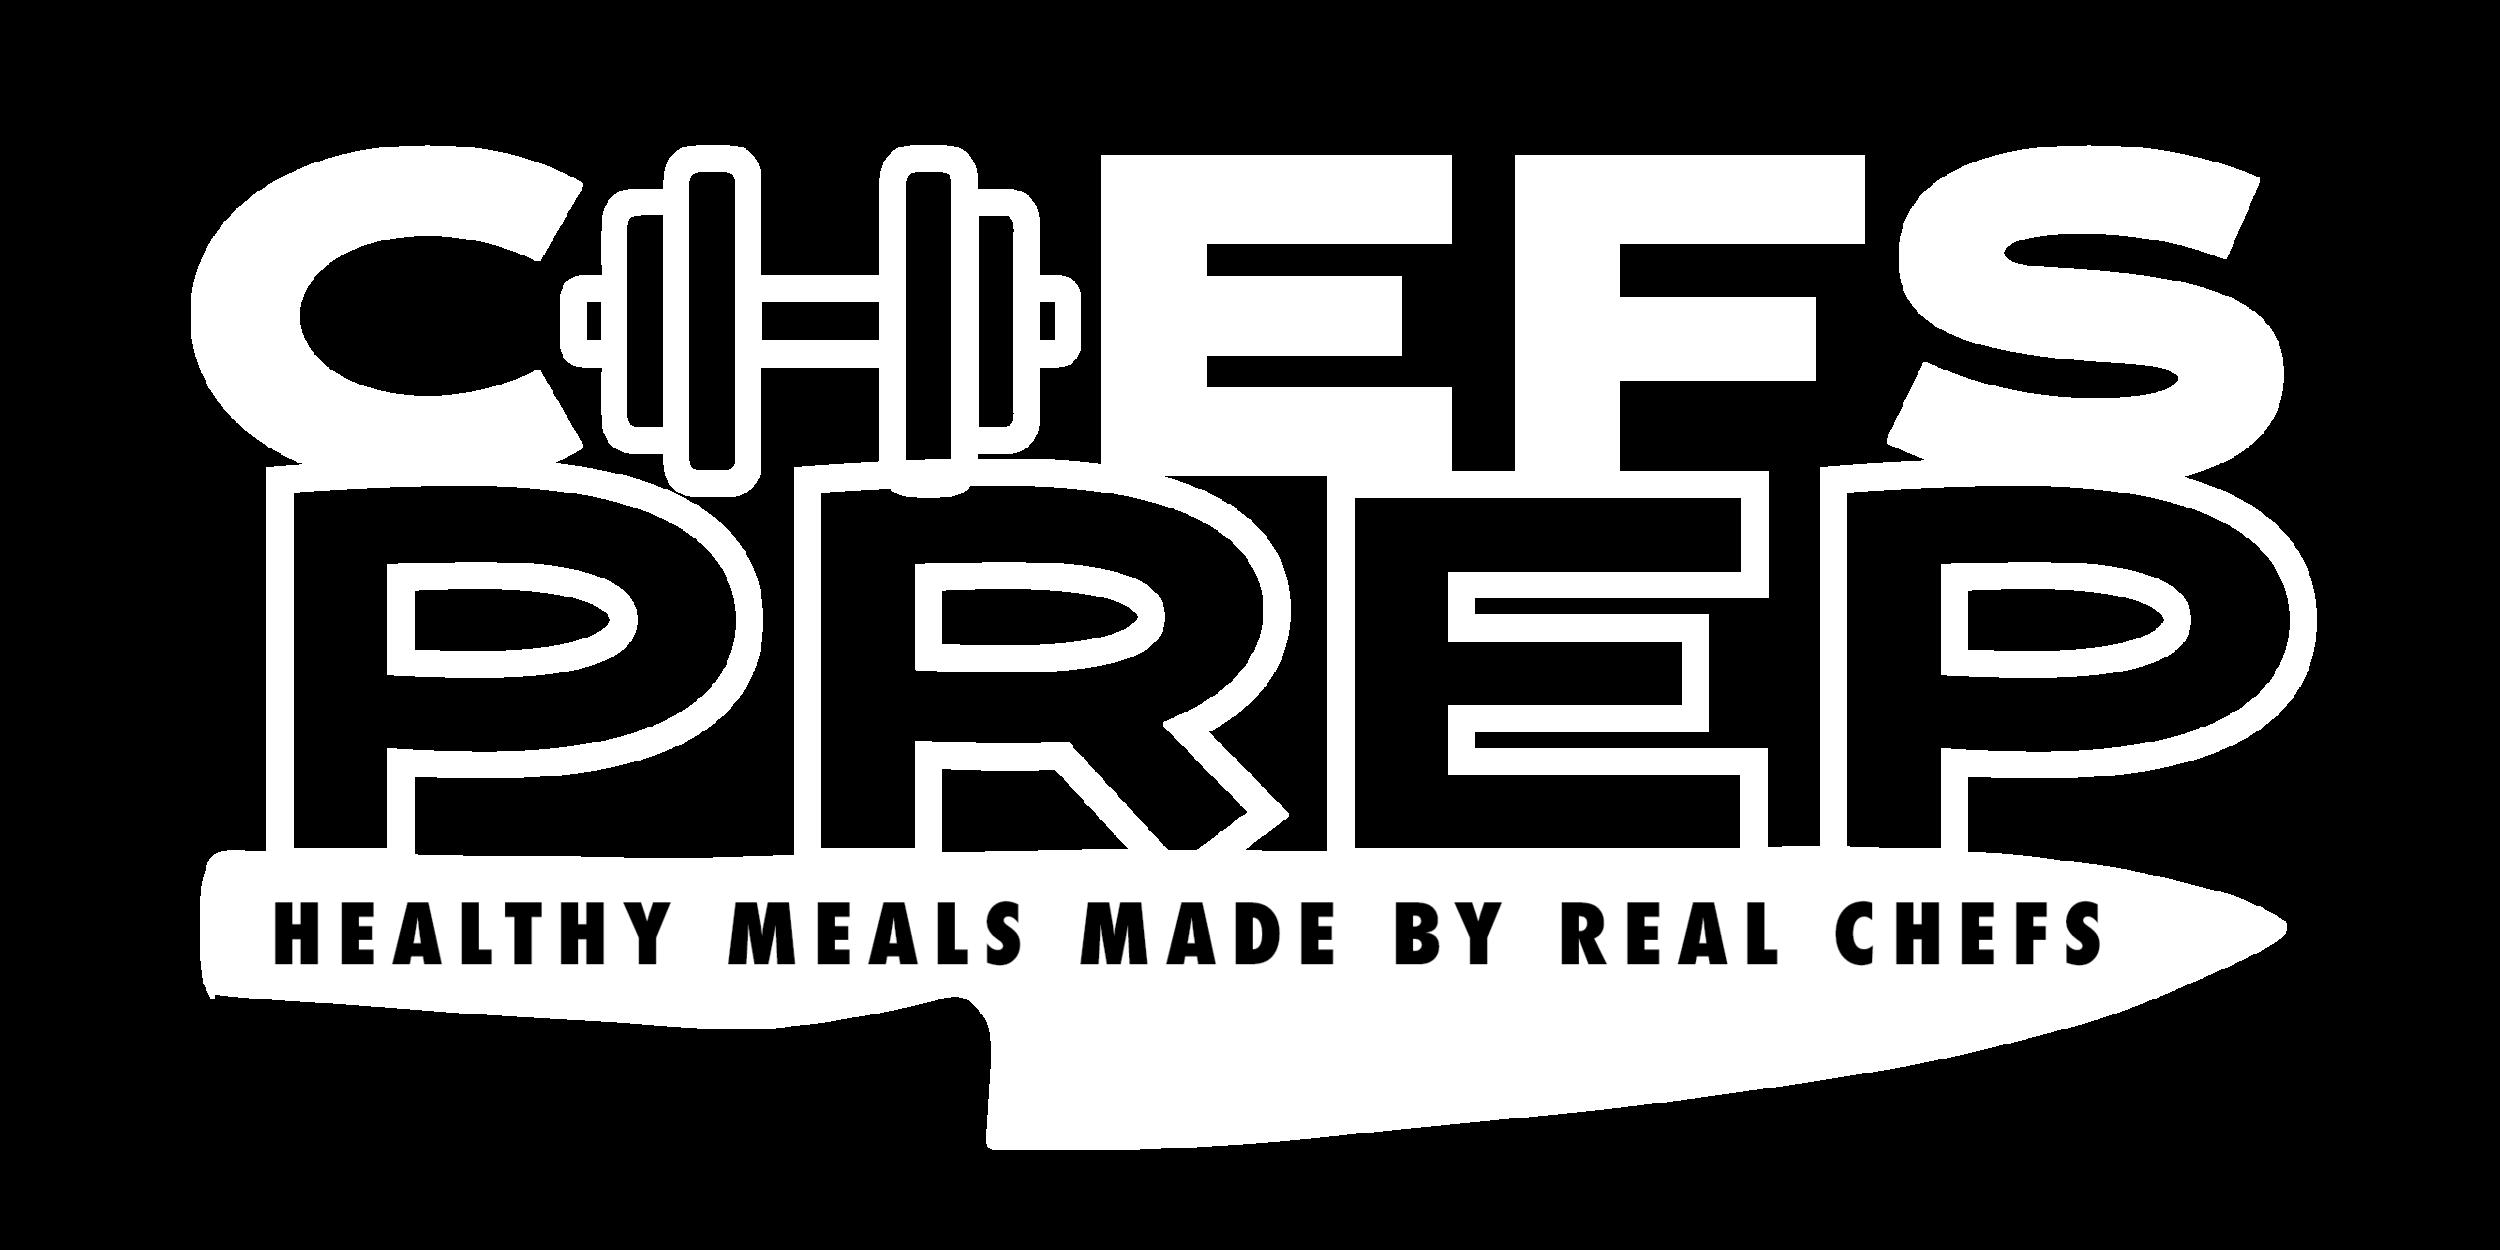 chefsprep-logo-reverse-2019-04.png